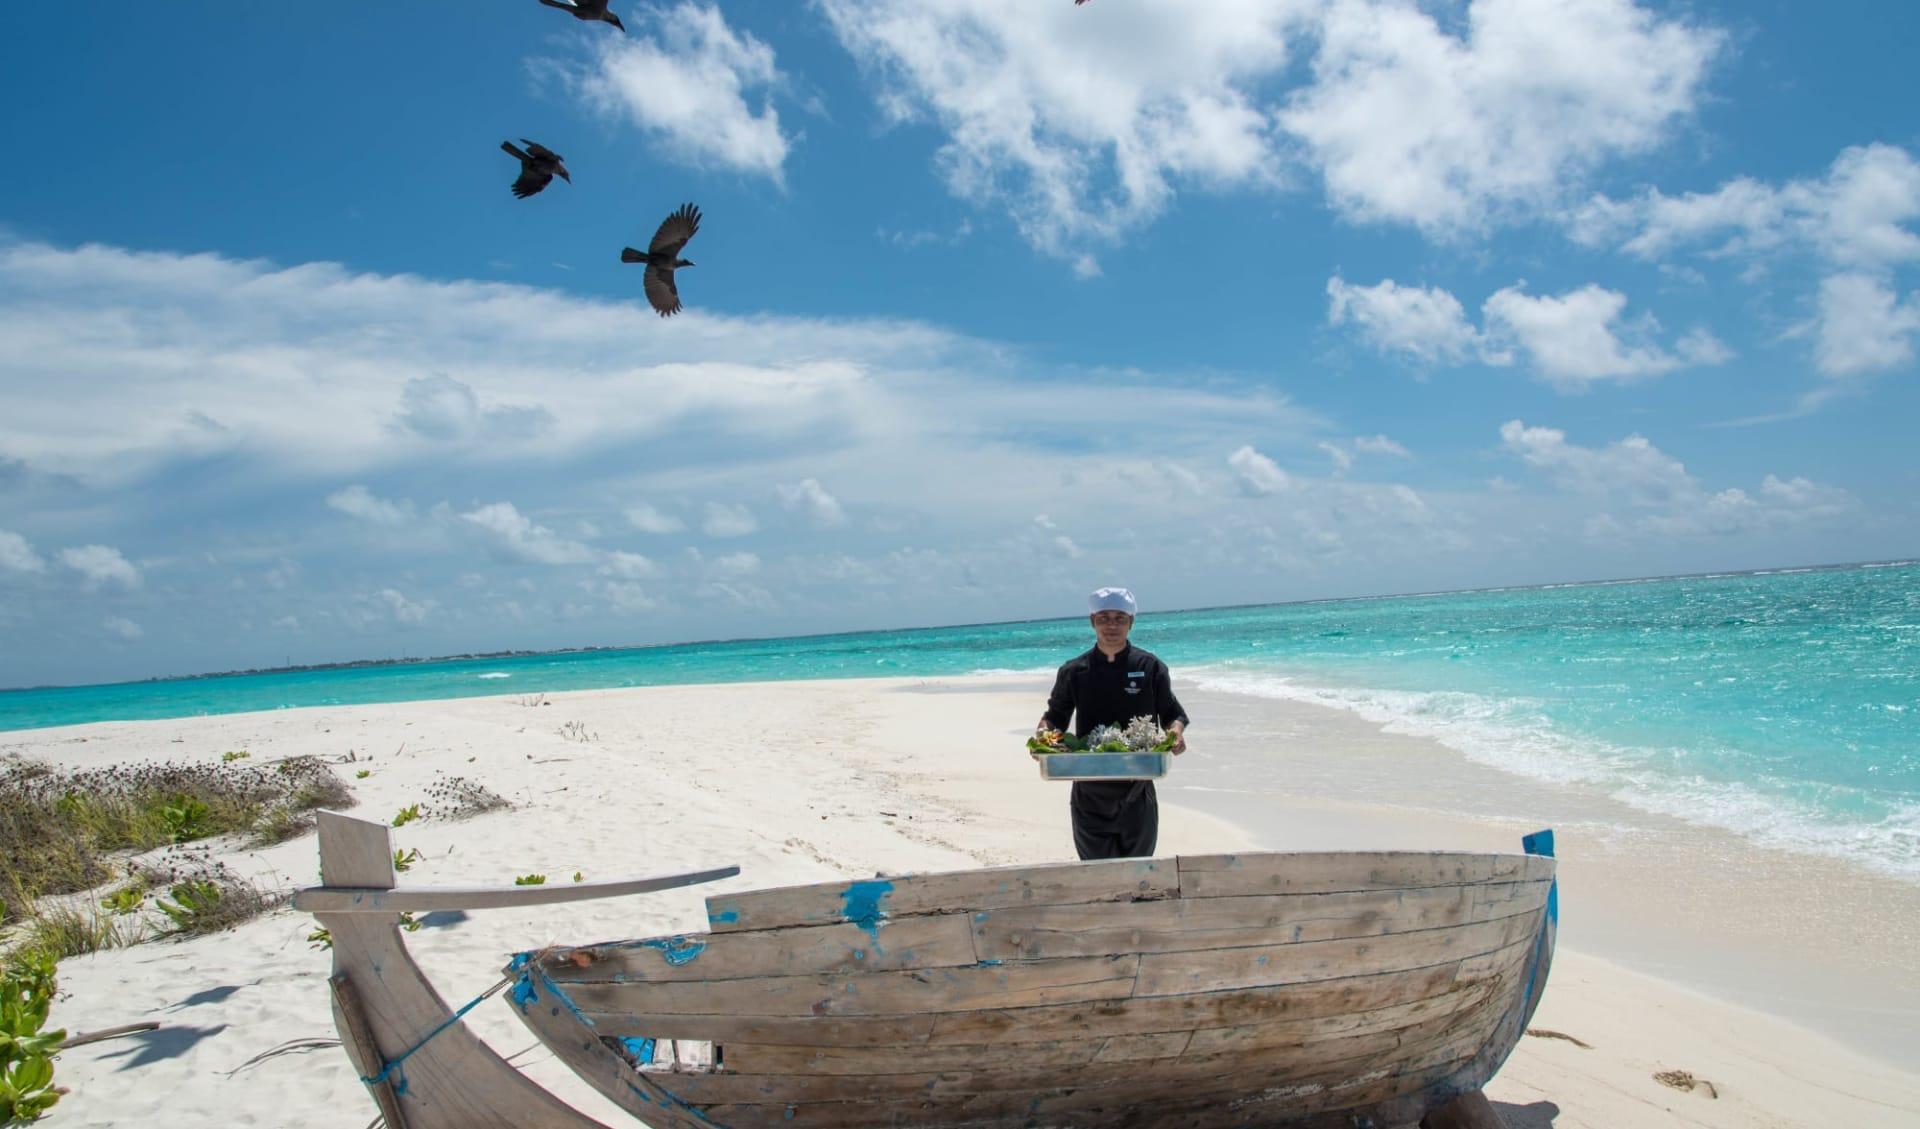 Hideaway Beach Resort & Spa in Haa Alifu-Atoll: